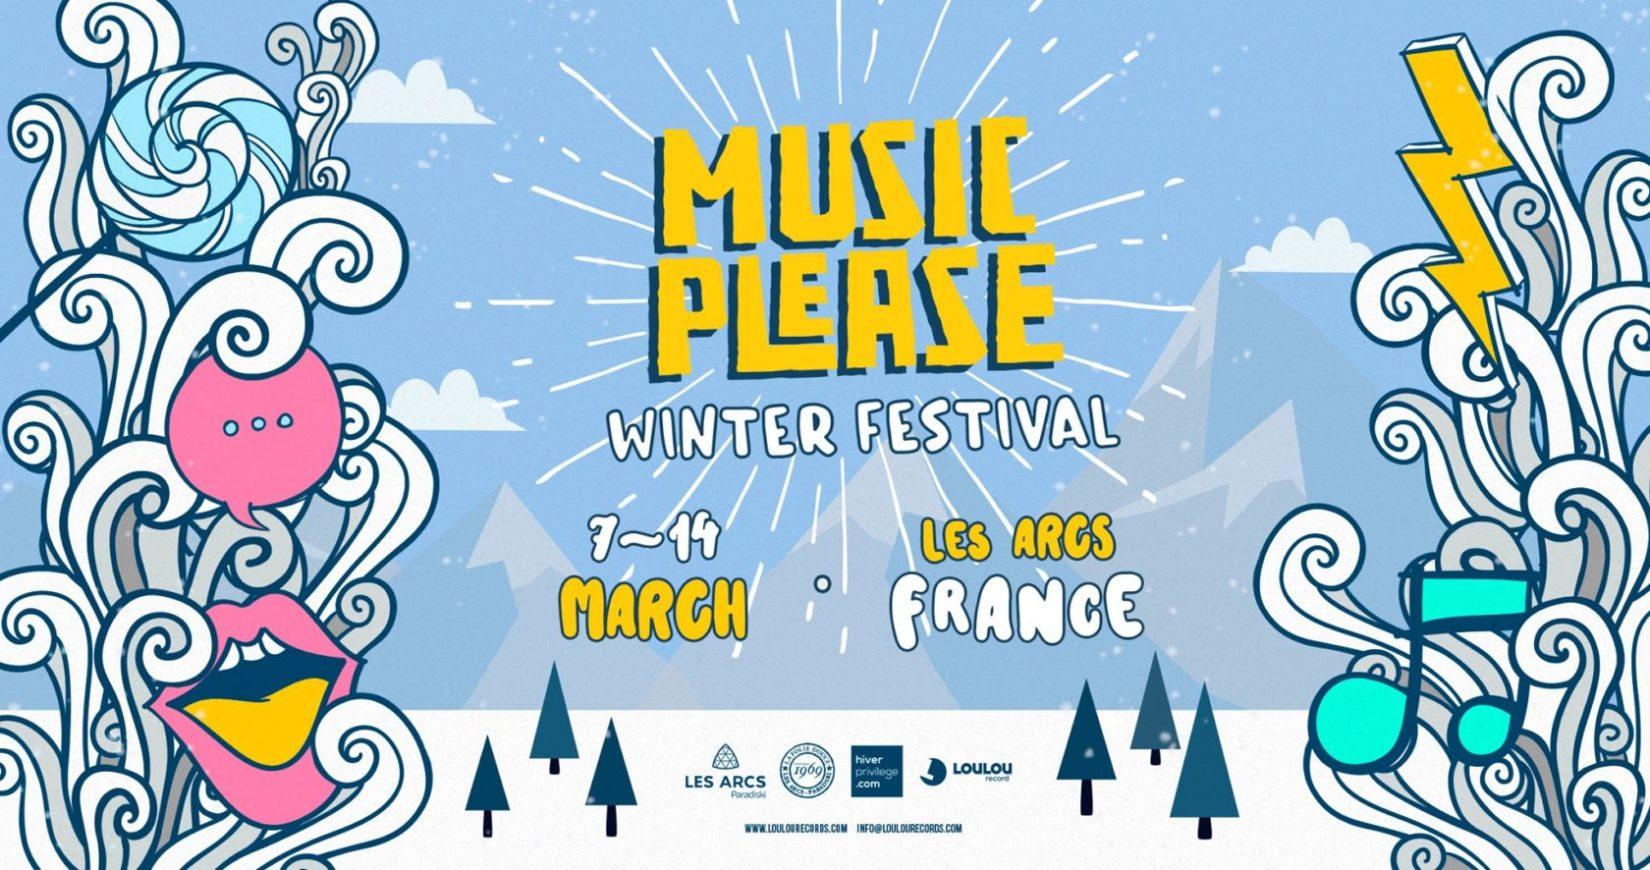 Music Please Winter Festival 7 au 14 mars Les Arcs - France